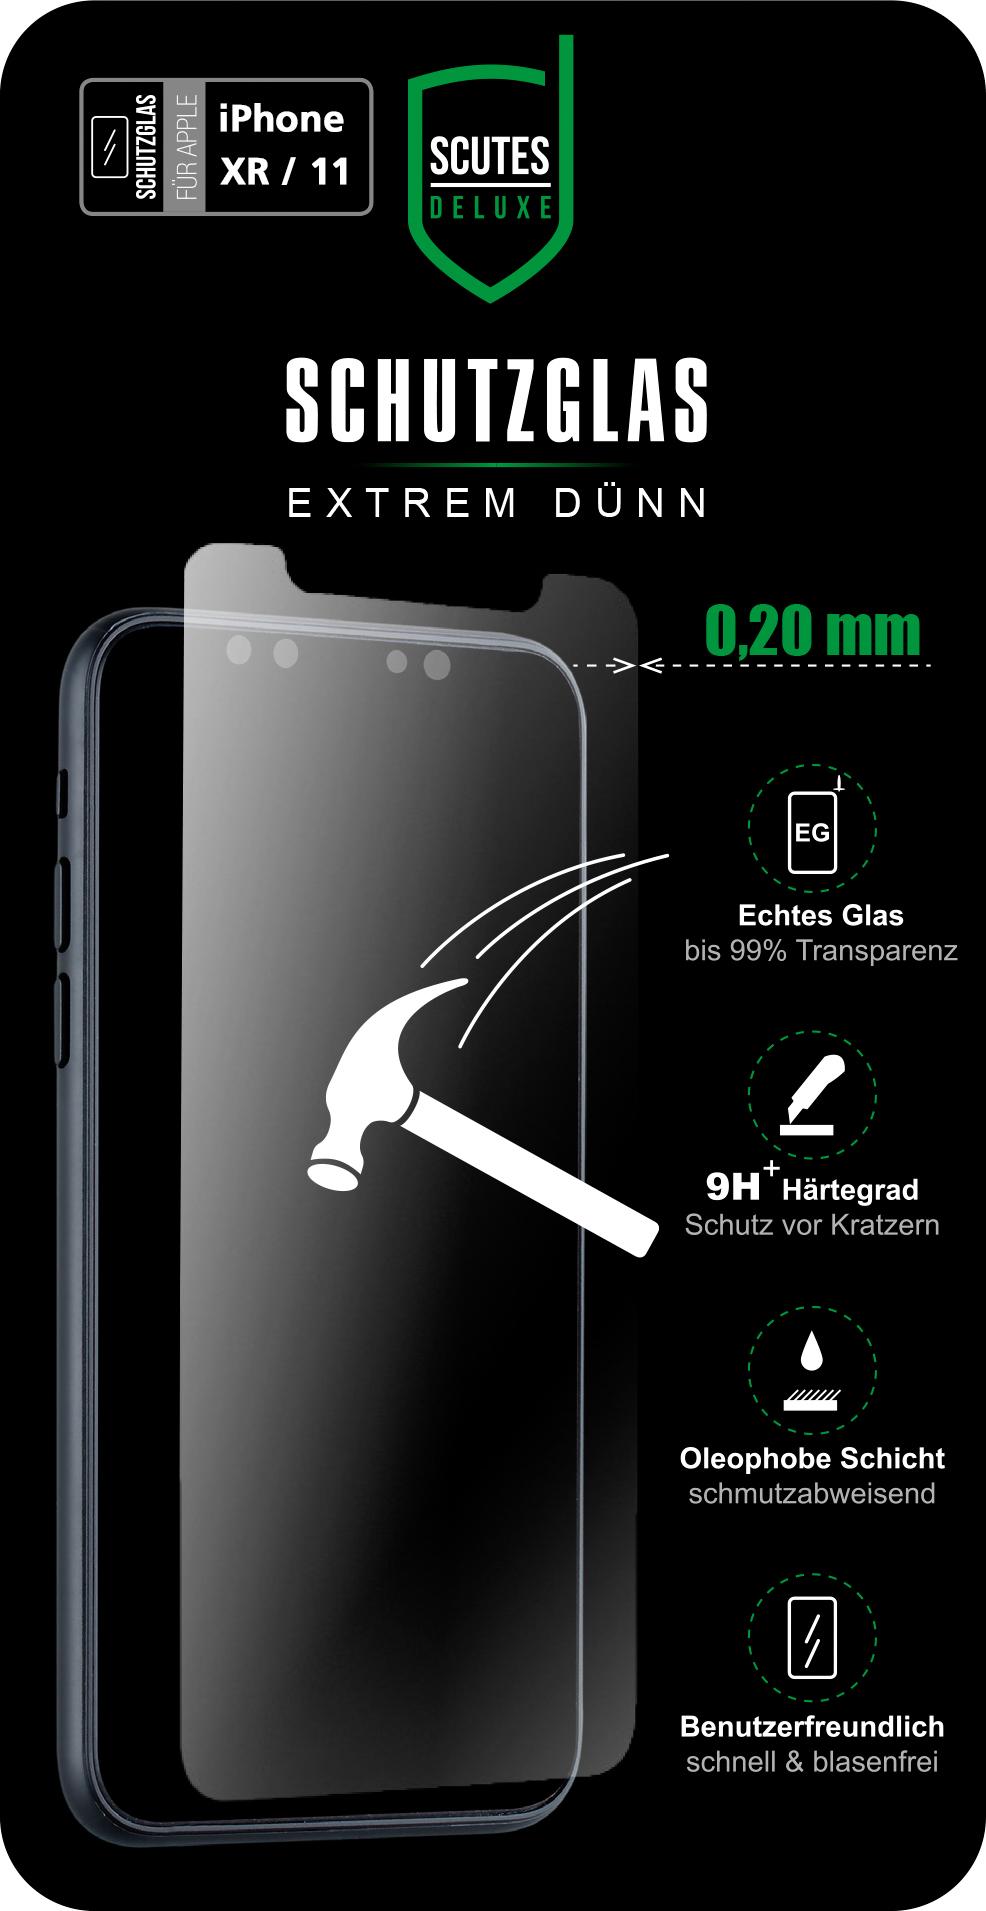 Schutzglas (iPhone 11)